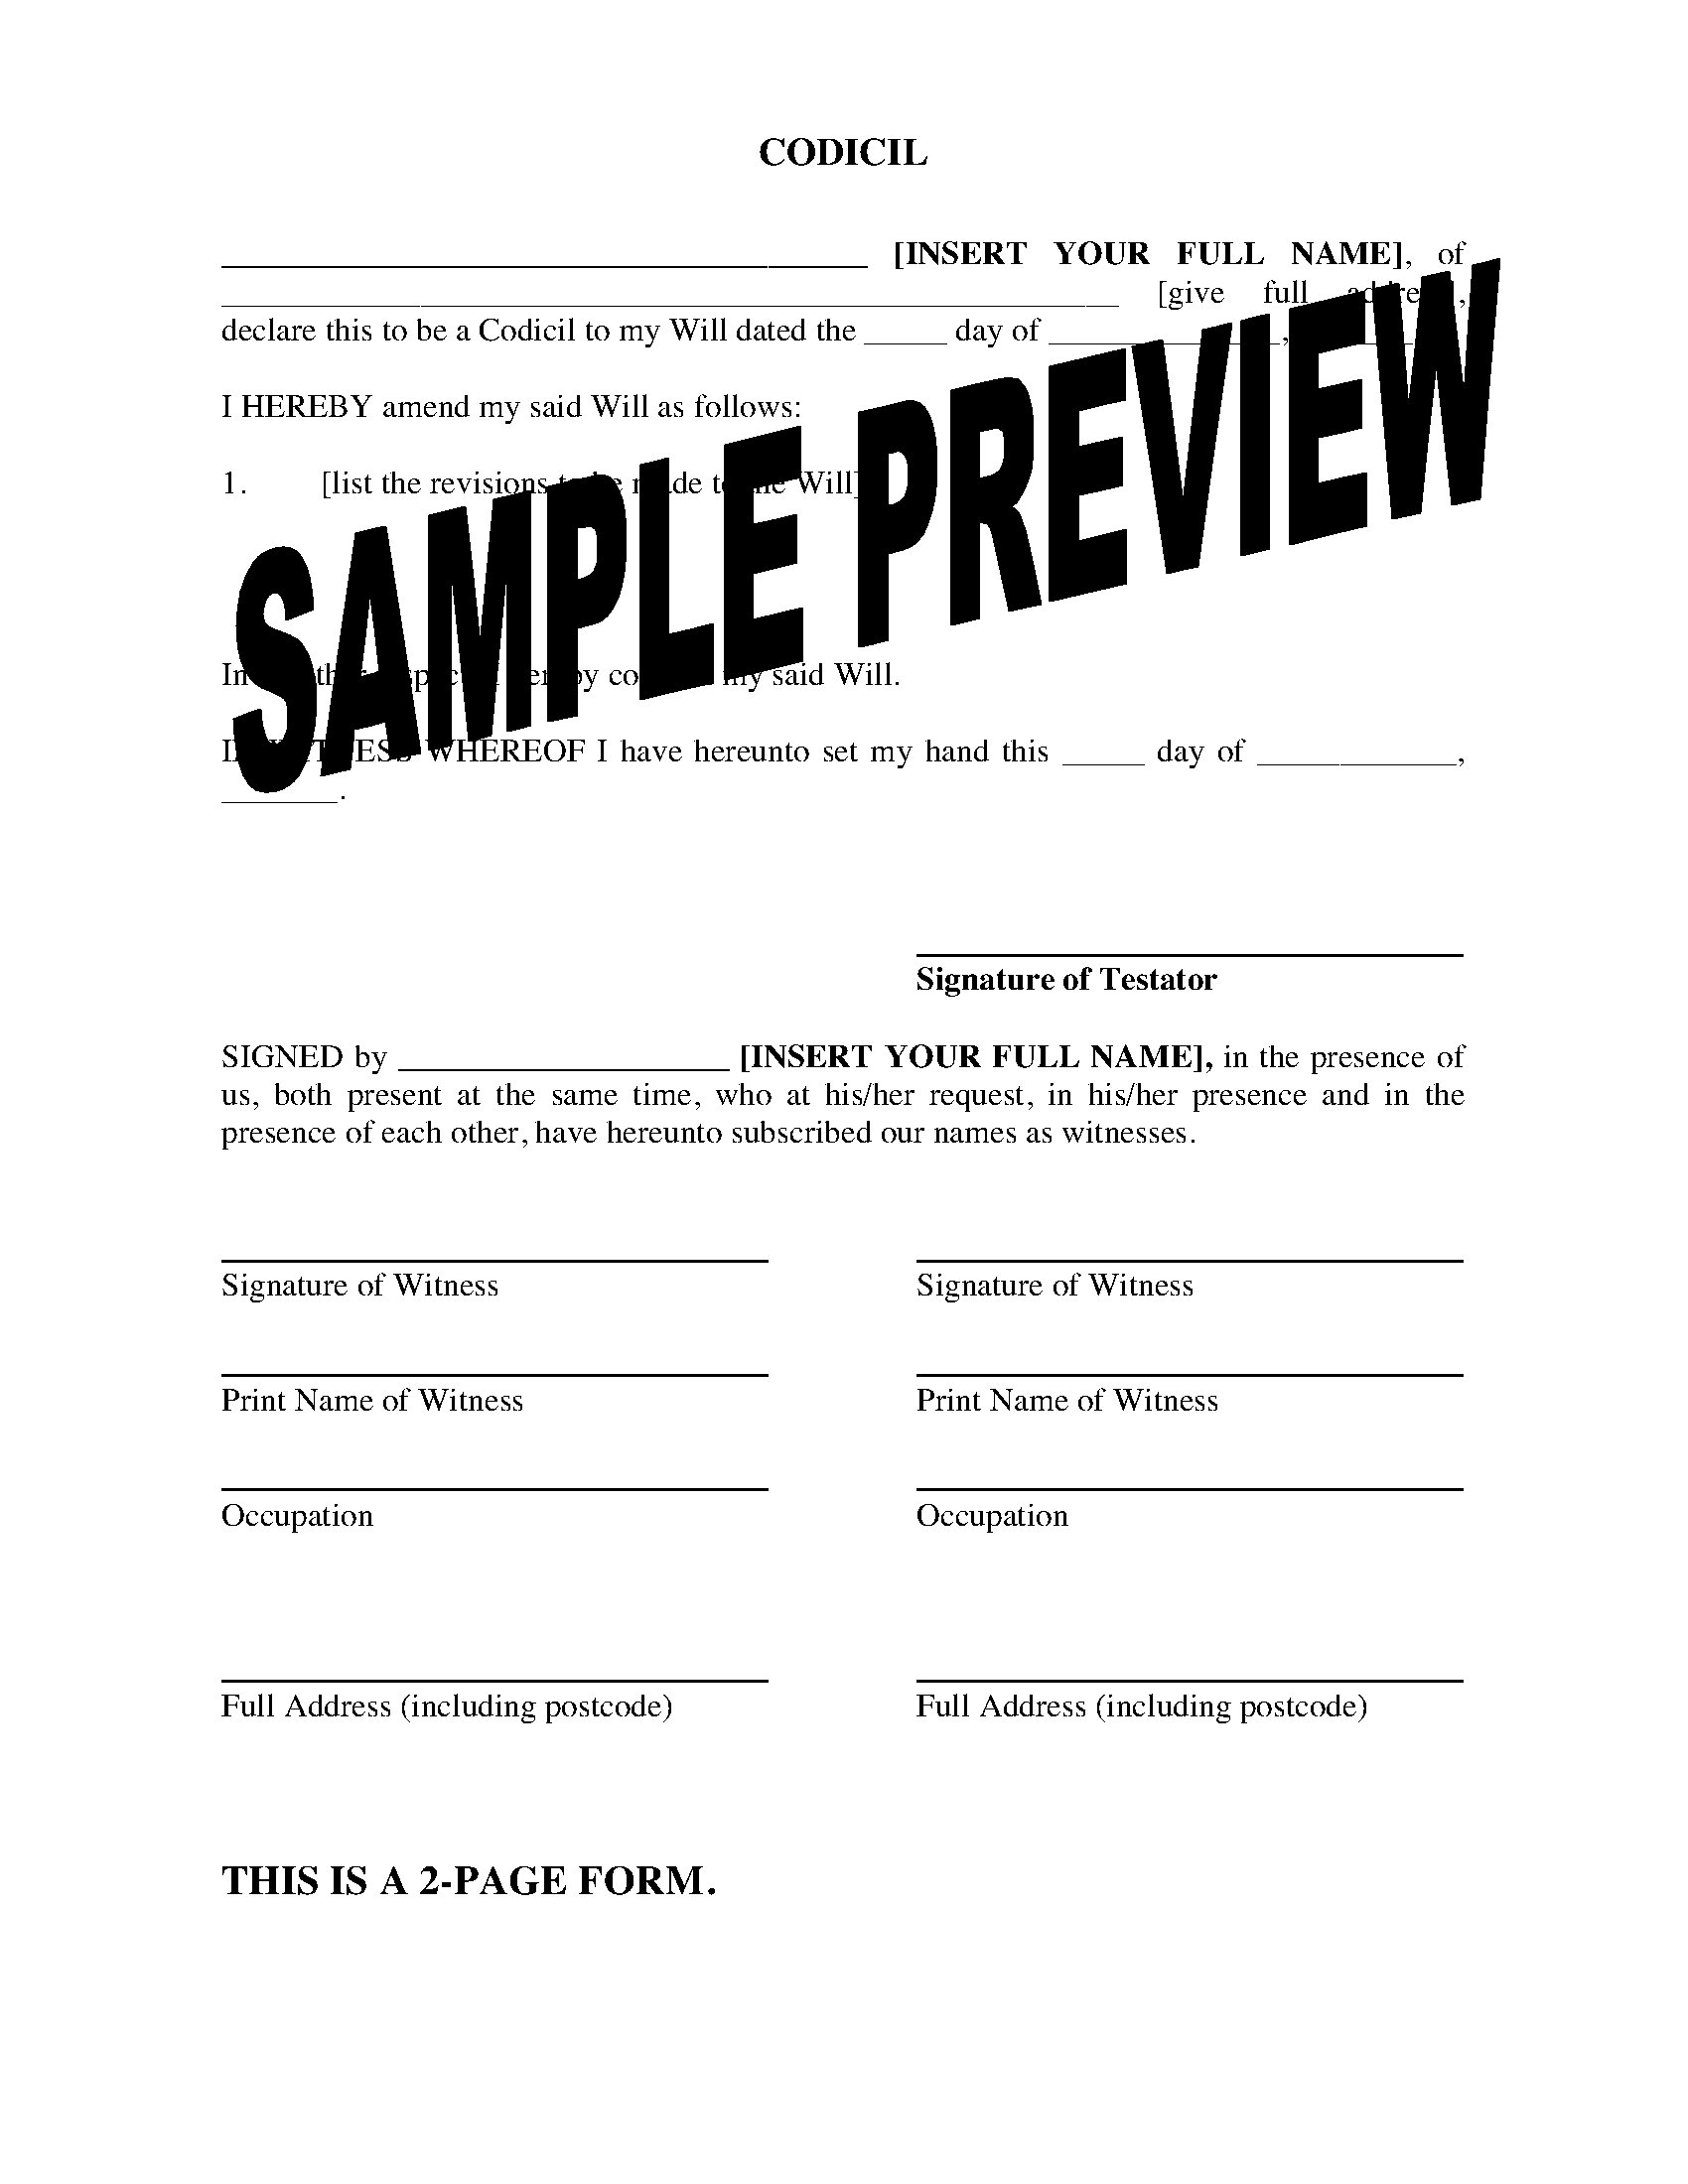 Missouri Form 14 Instructions